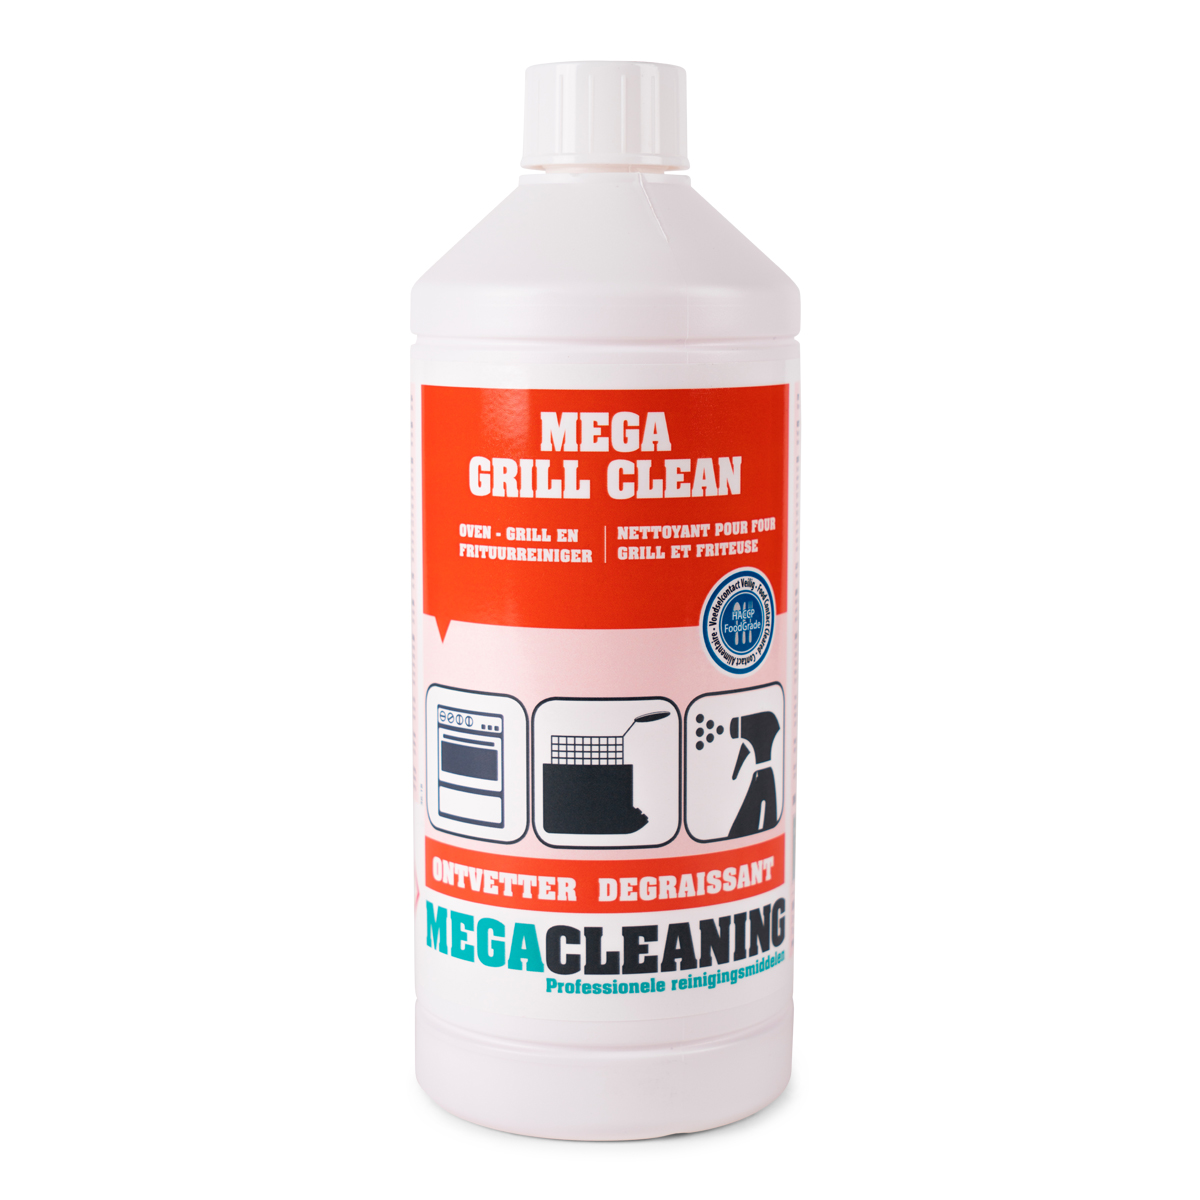 MEGA Grill Clean, Grill Reiniger